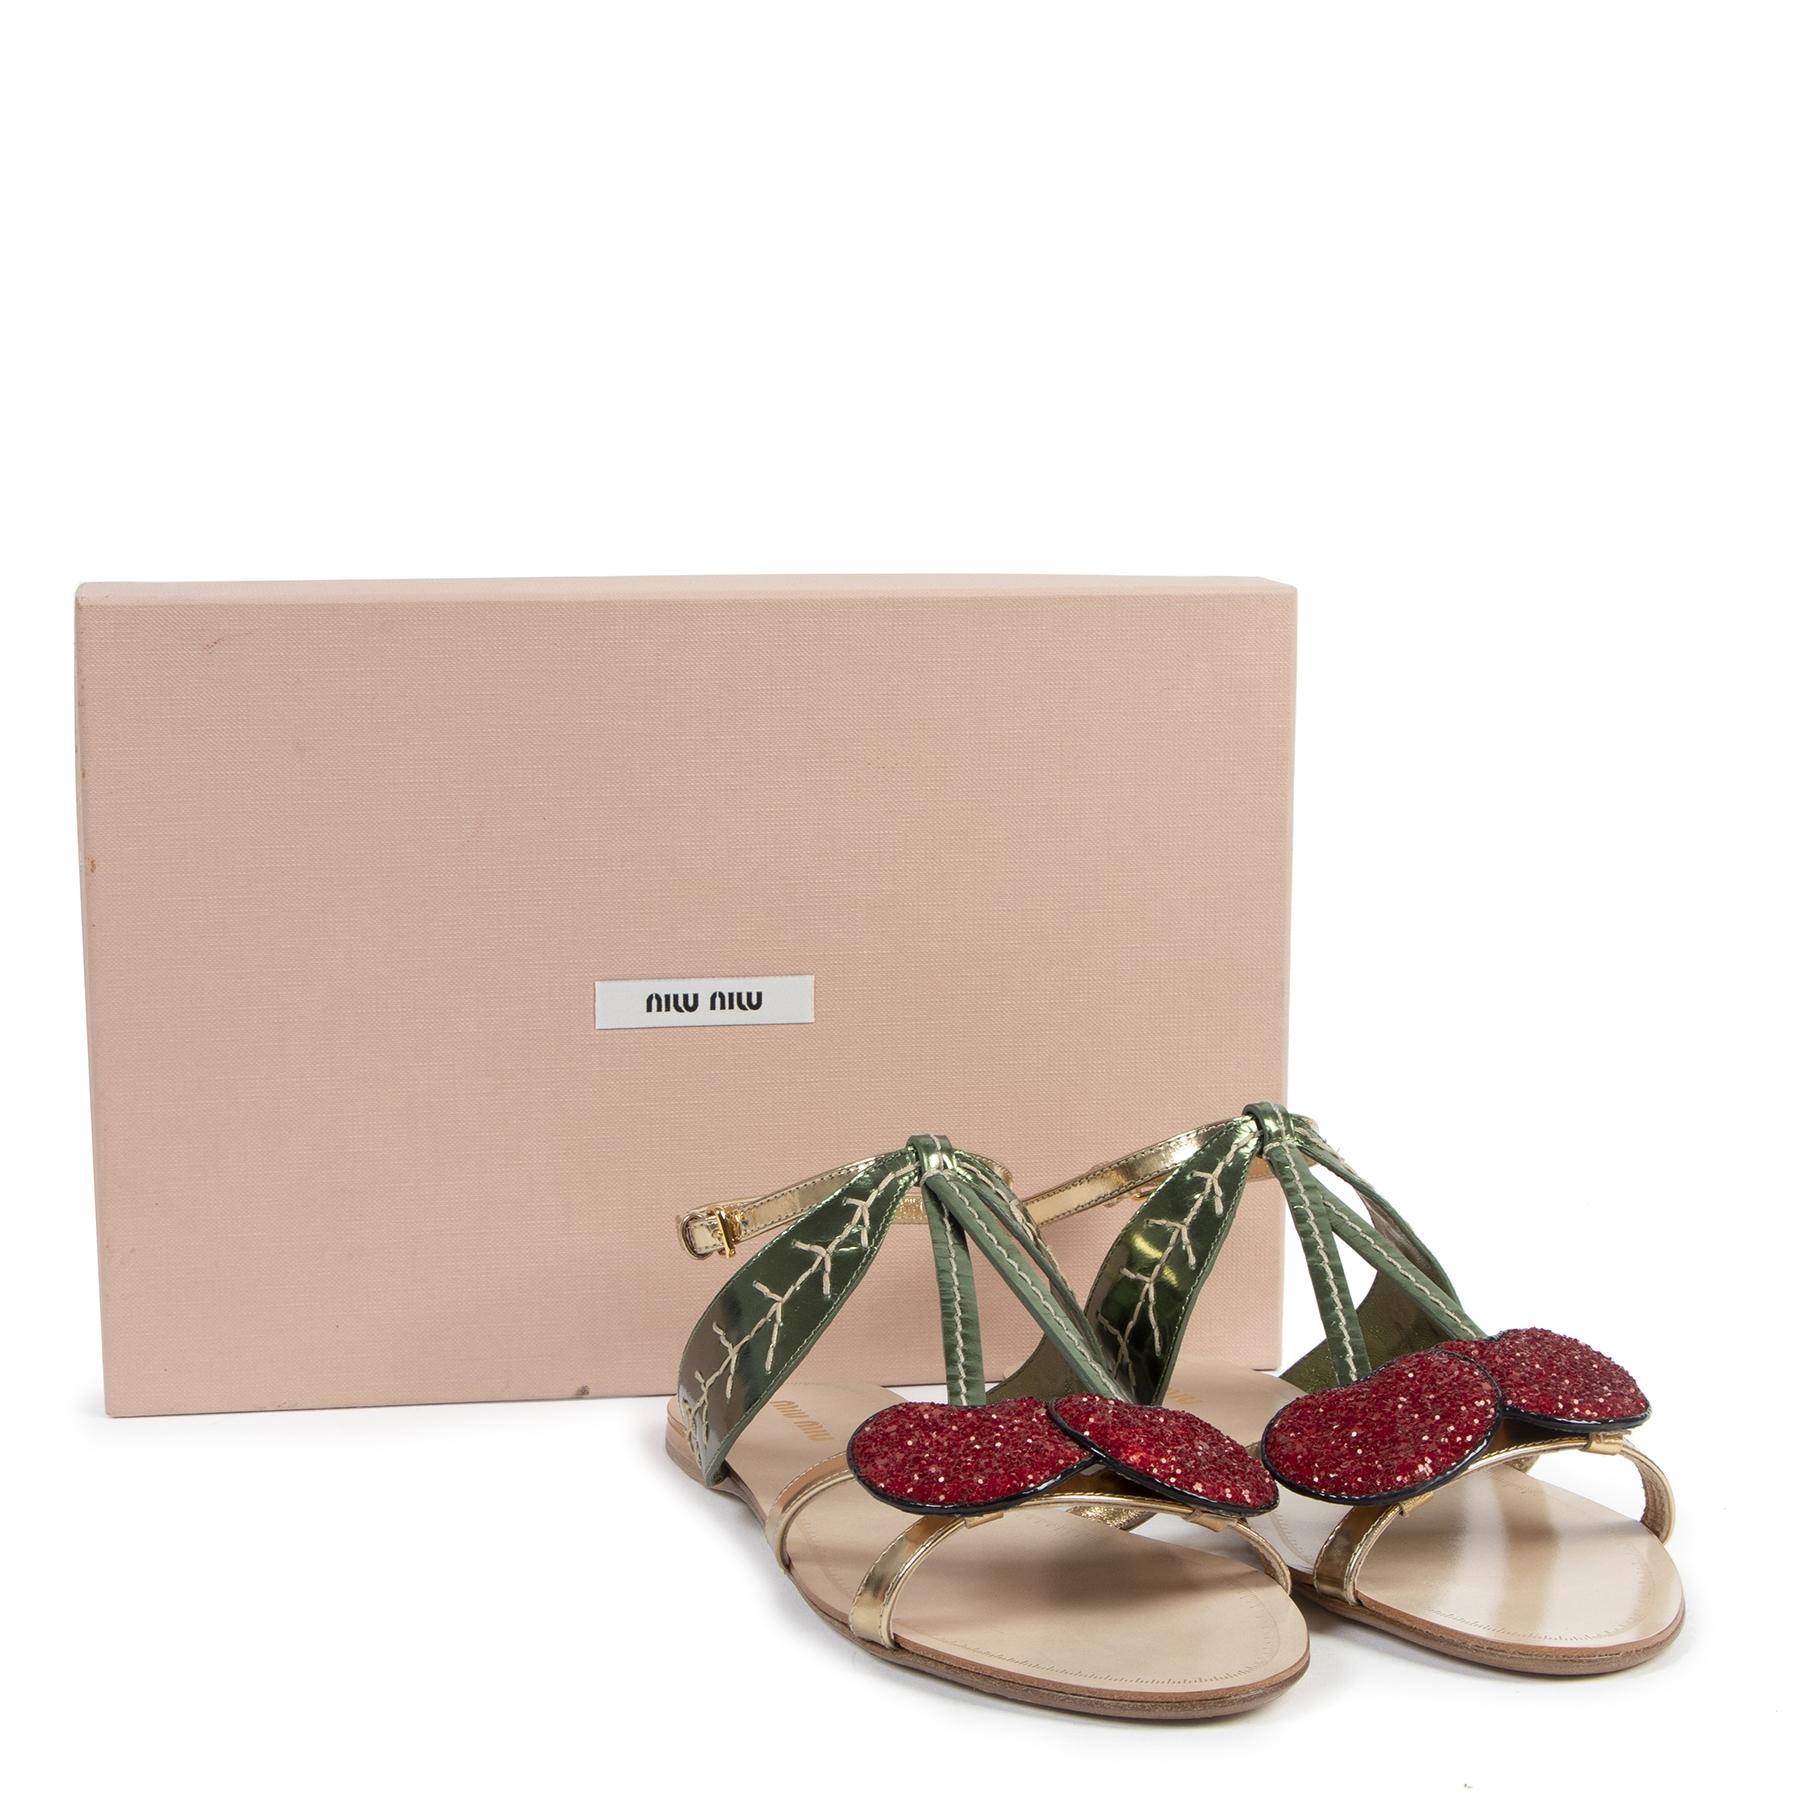 Authentic secondhand Miu Miu Cherry Sandals - Size 39,5 designer shoes luxury vintage webshop fashion safe secure online shopping